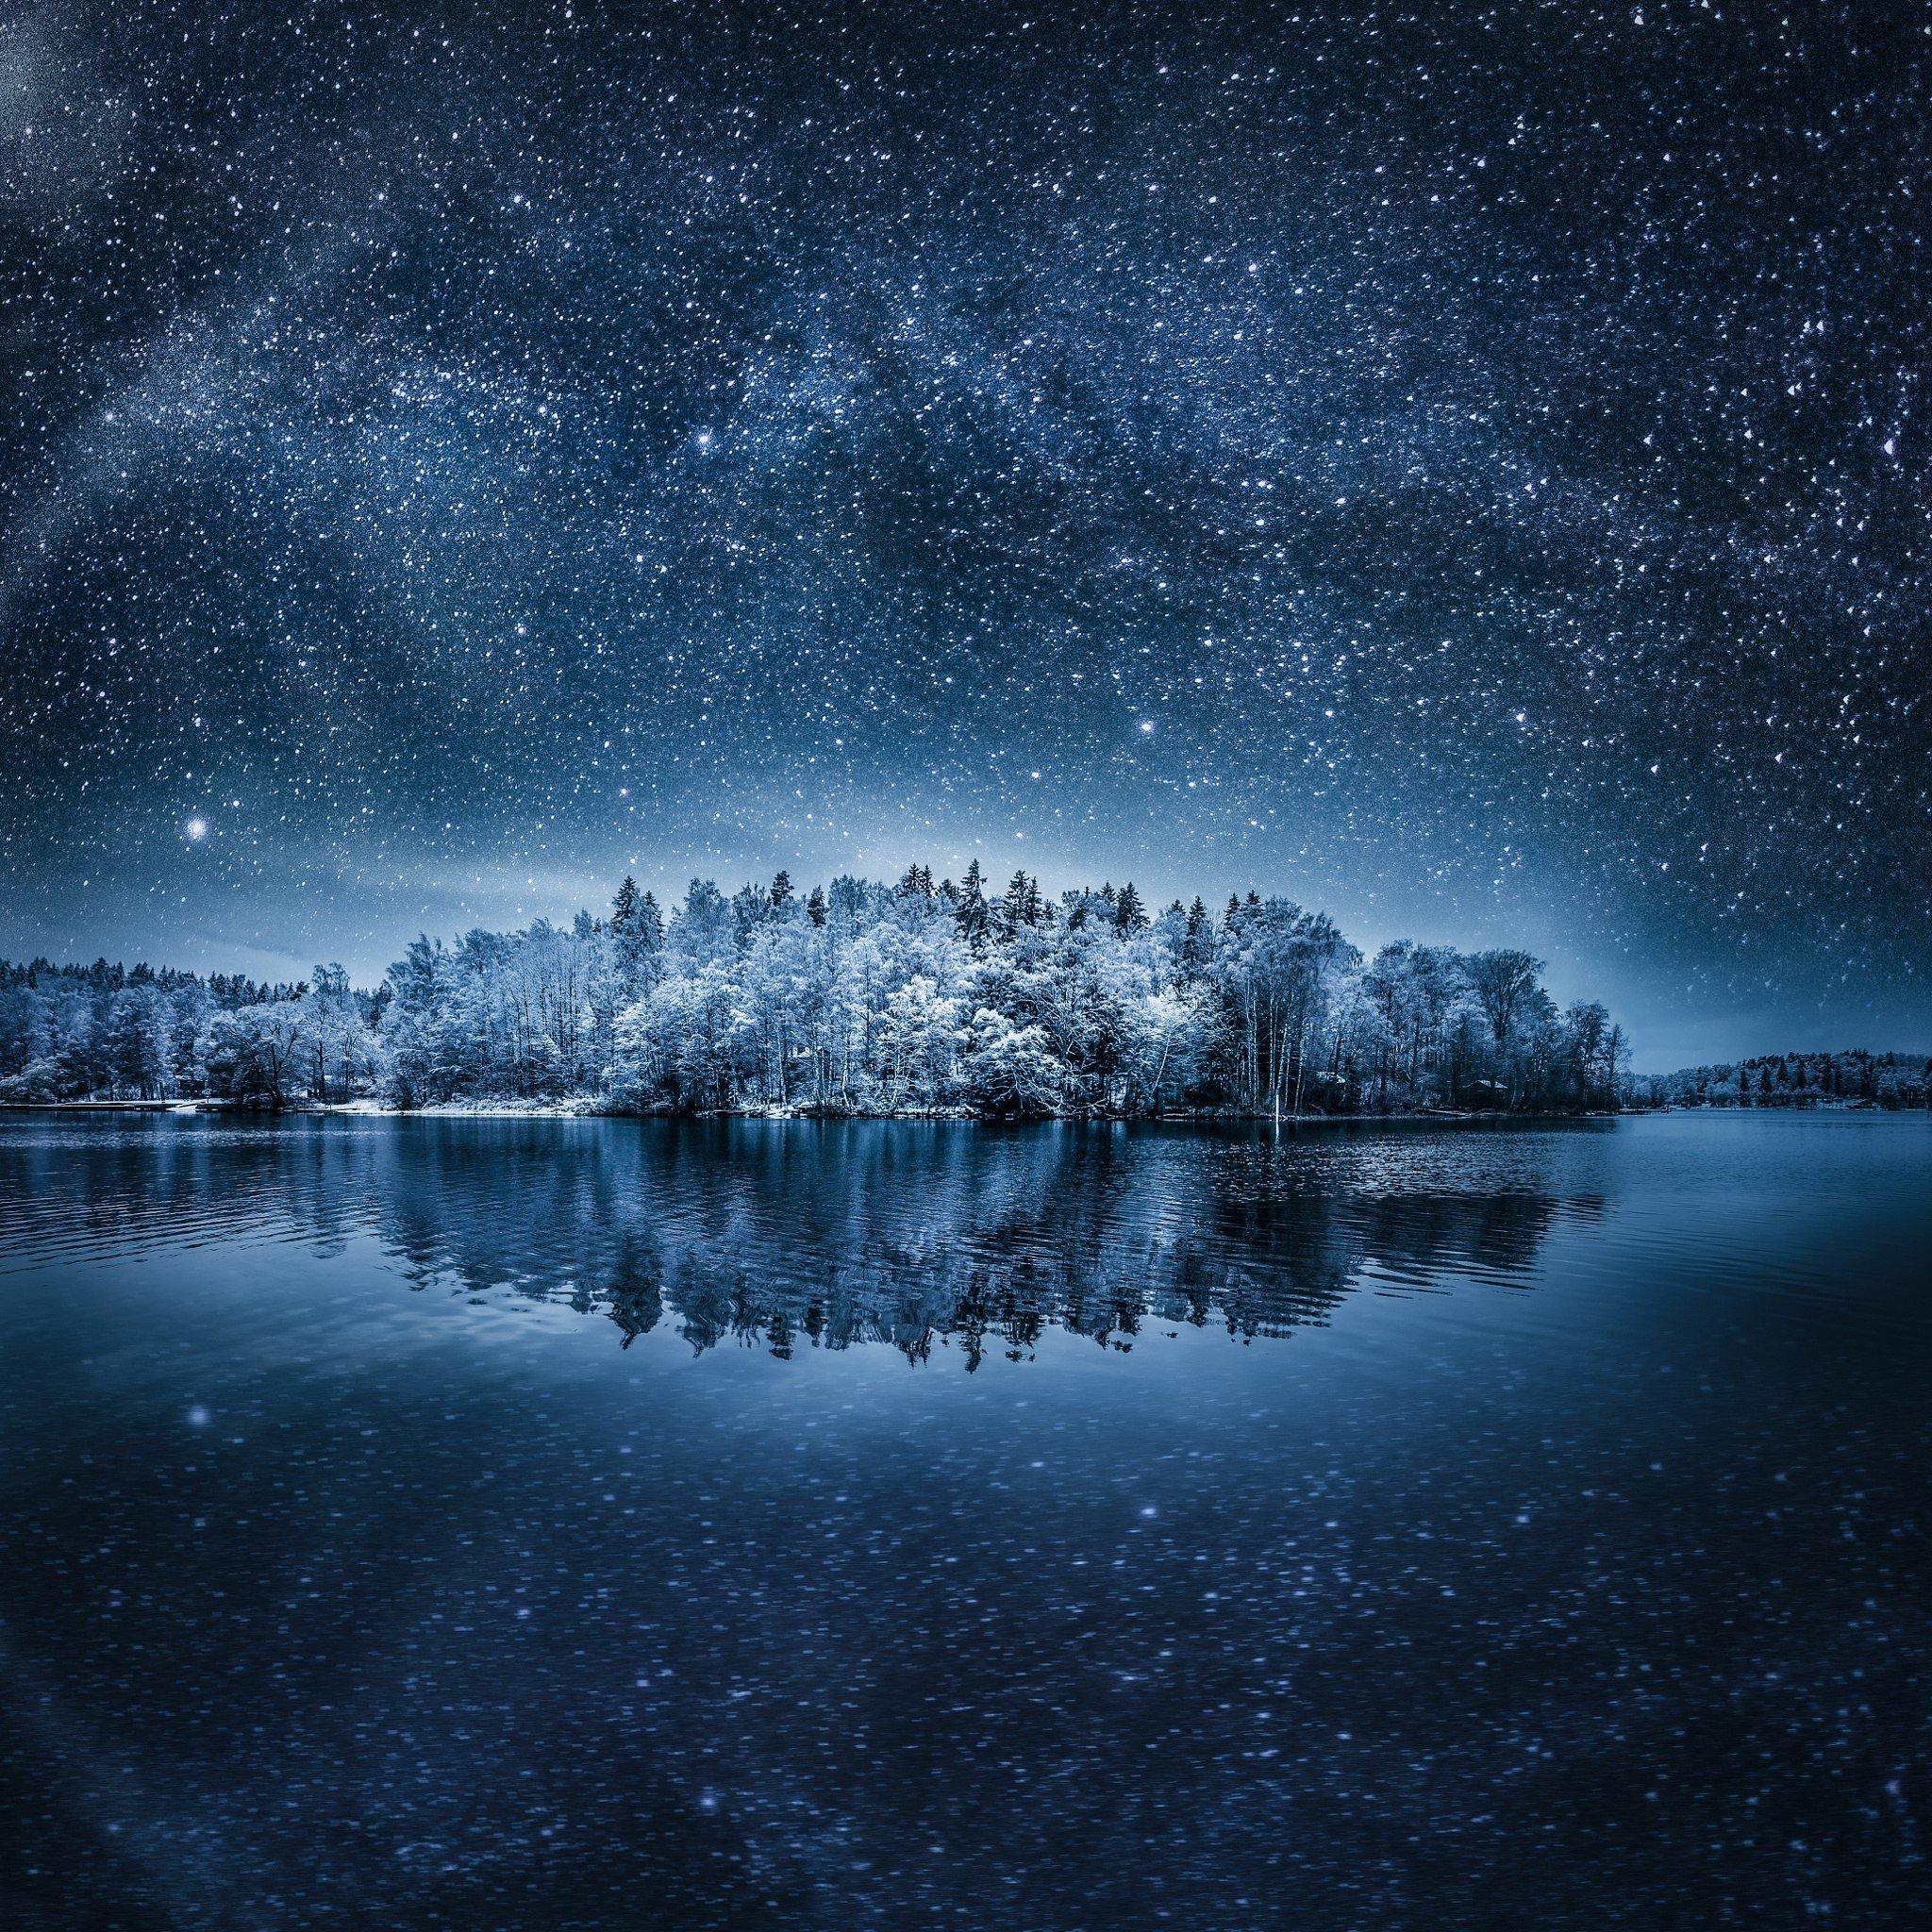 Night, Landscape, Winter, Stars, Nature HD Wallpapers